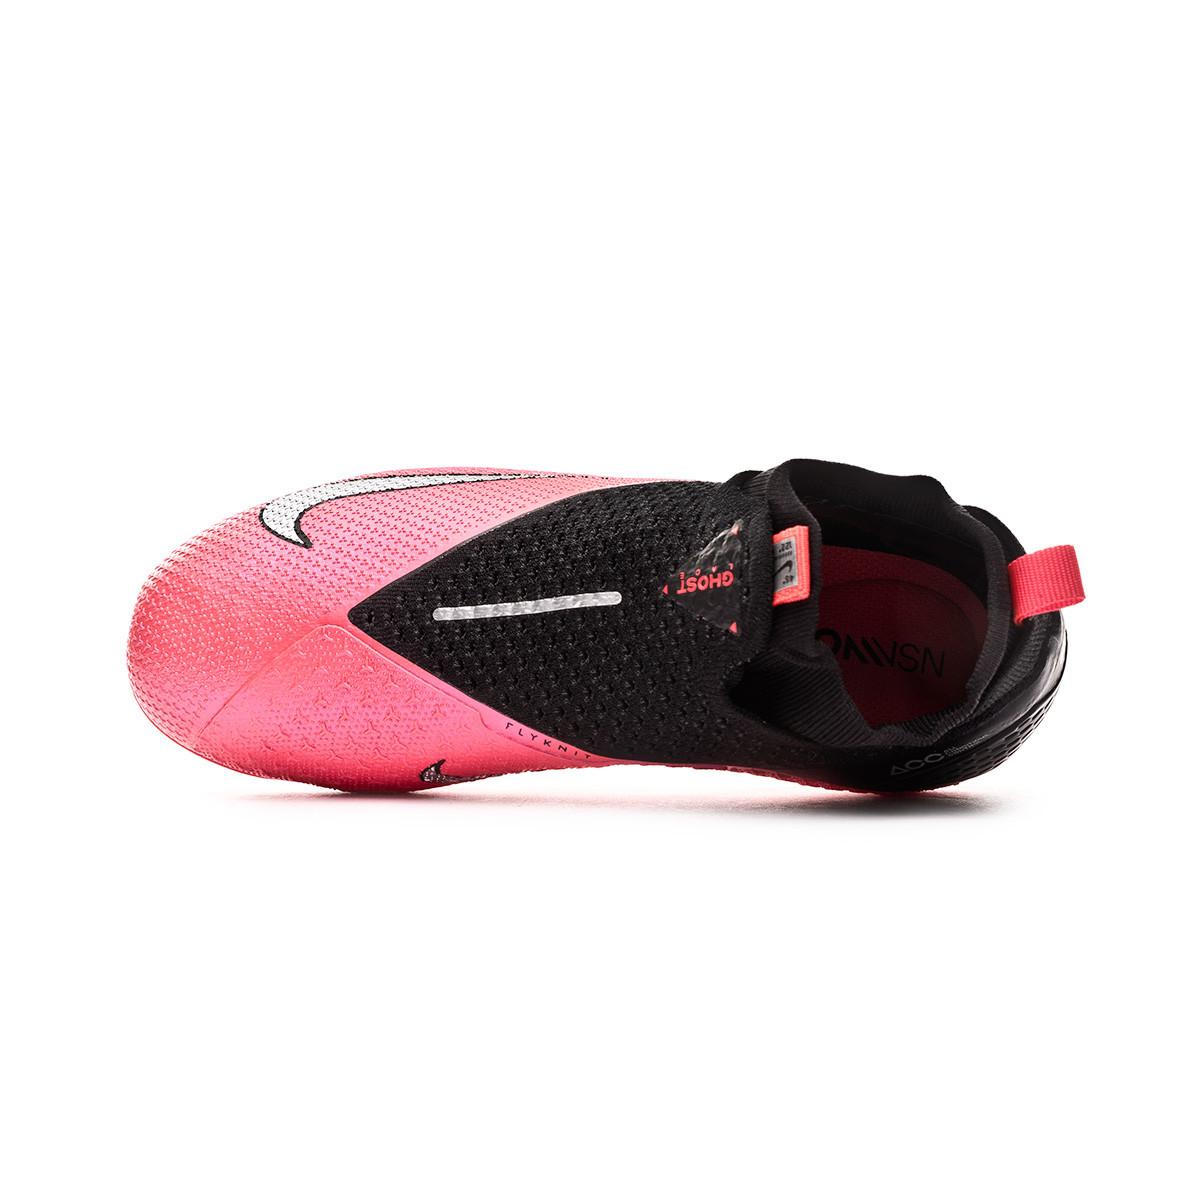 Chaussure de foot Nike Phantom Vision II Elite DF FGMG Enfant